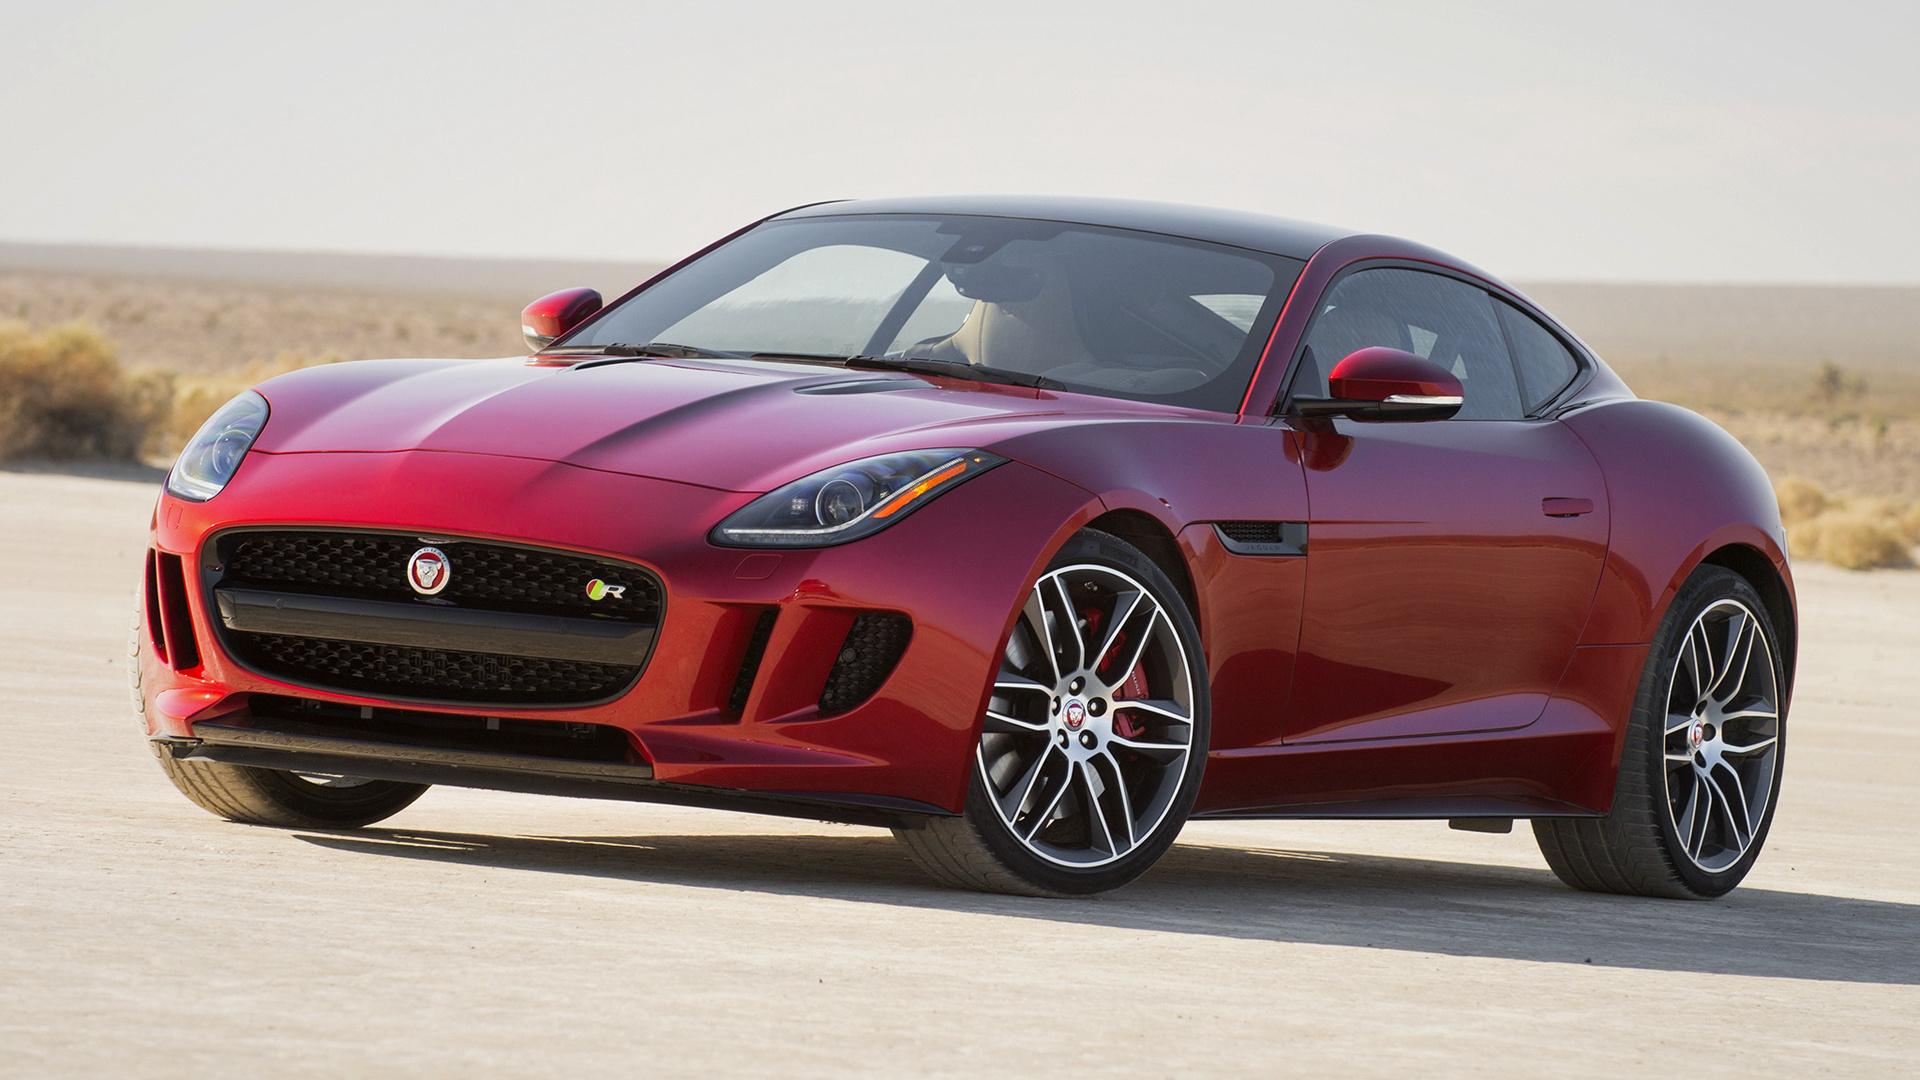 2015 Jaguar F-Type R Coupe HD Wallpaper | Background Image ...